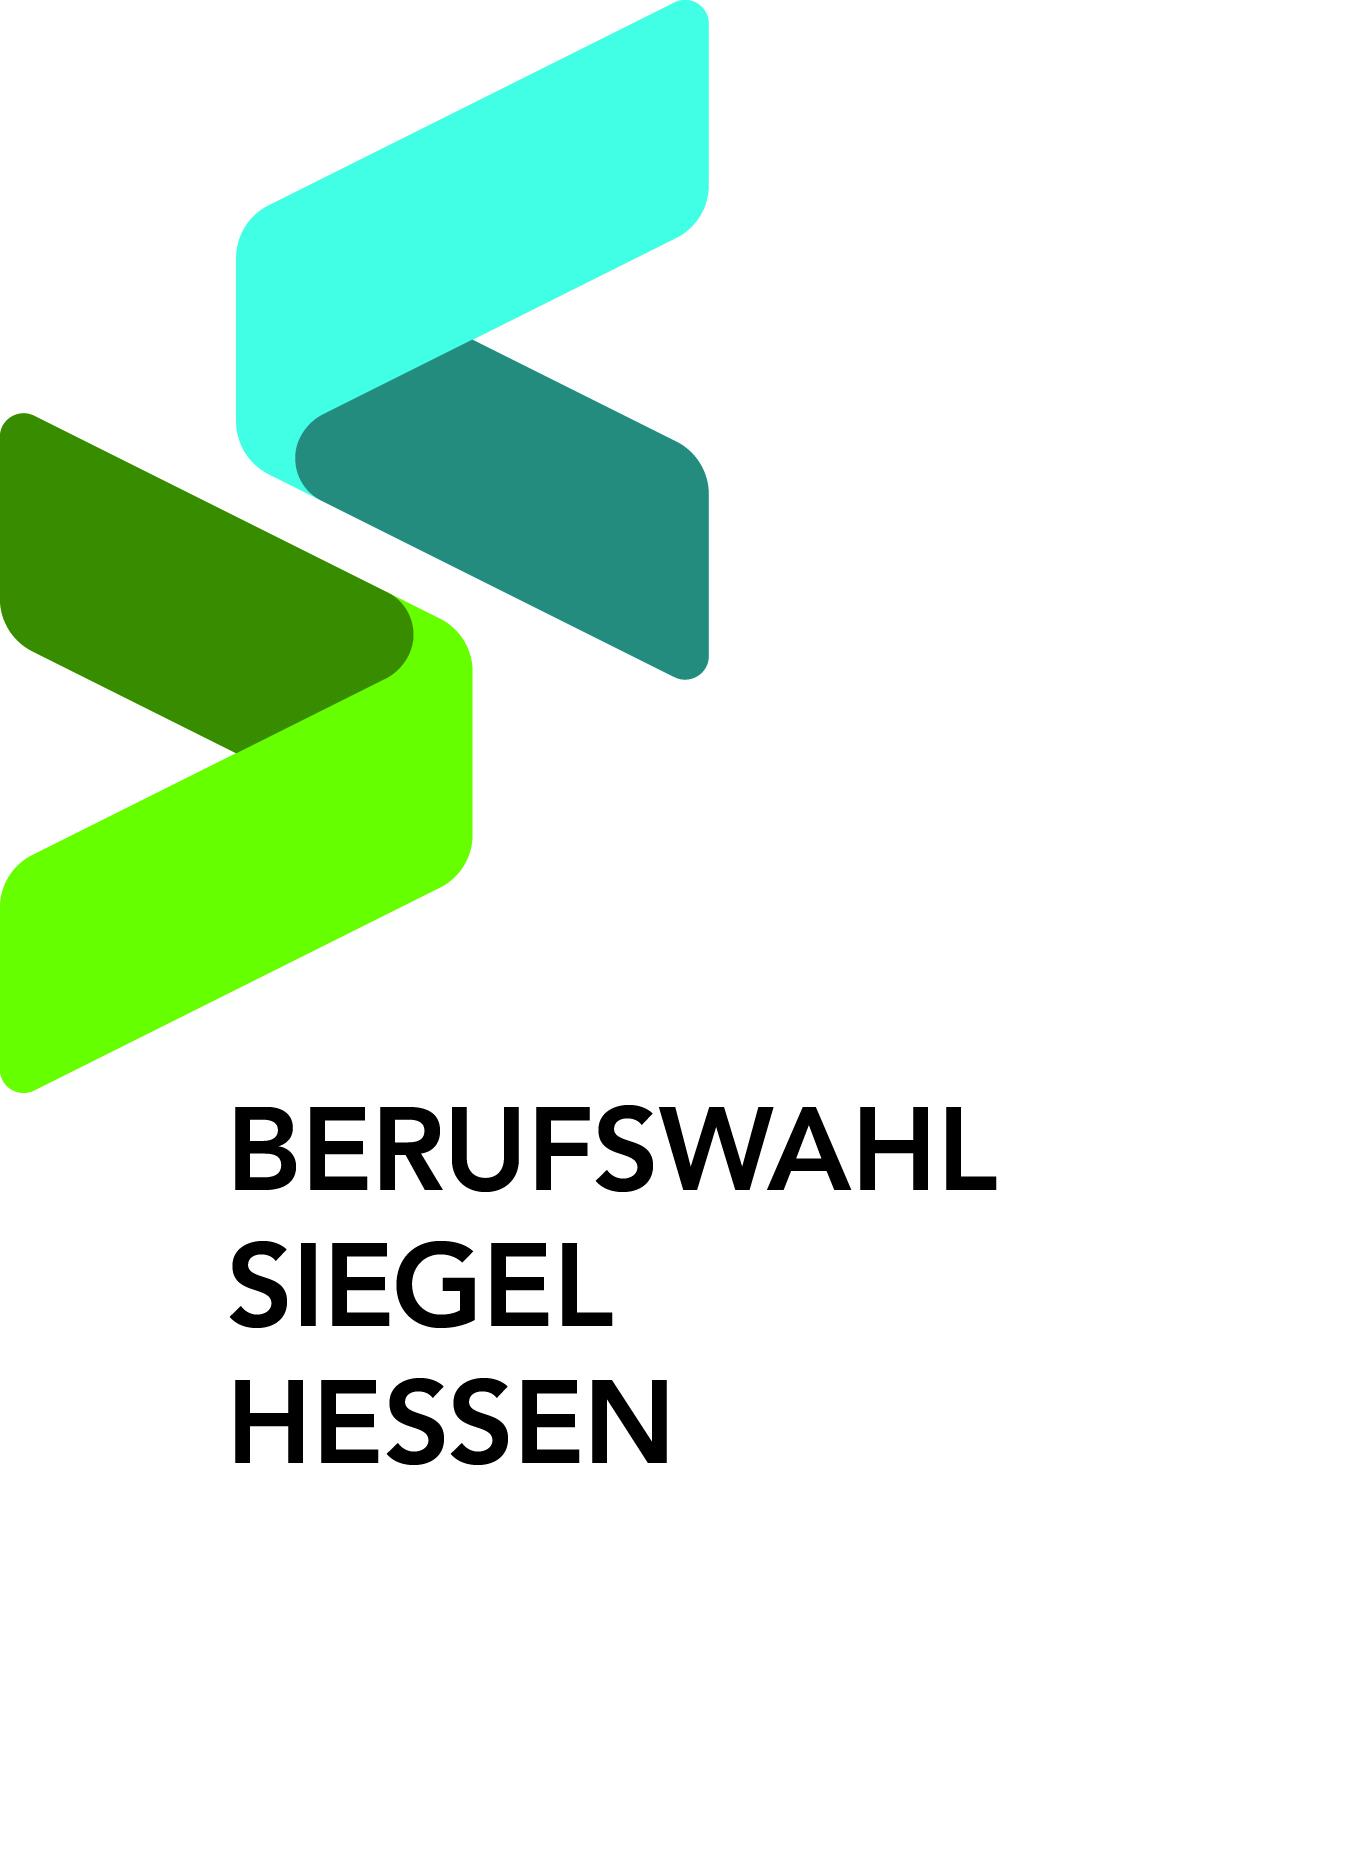 Berufswahlsiegel Hessen